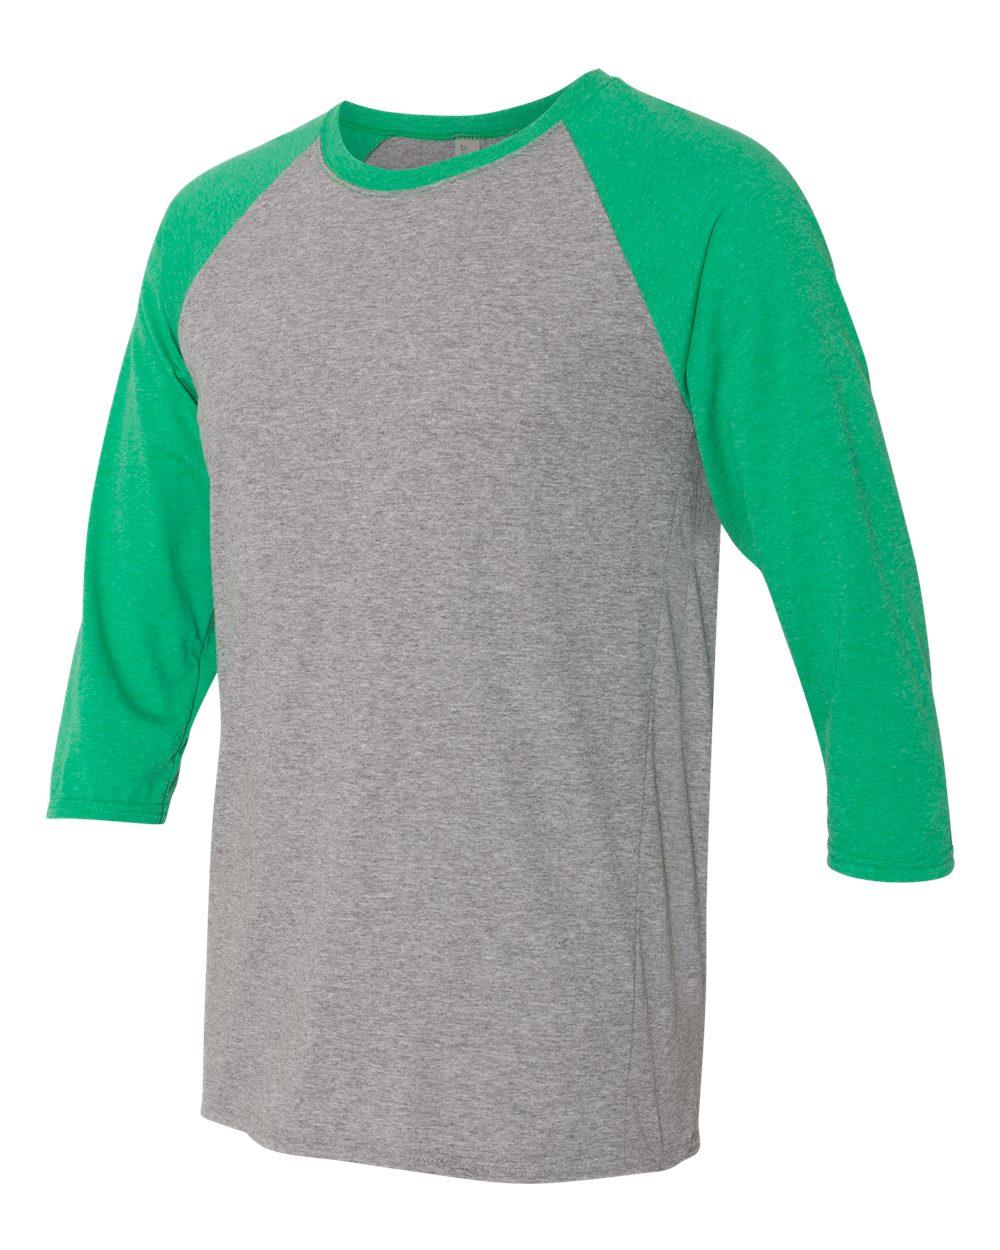 click to view Oxford/ Irish Green Heather